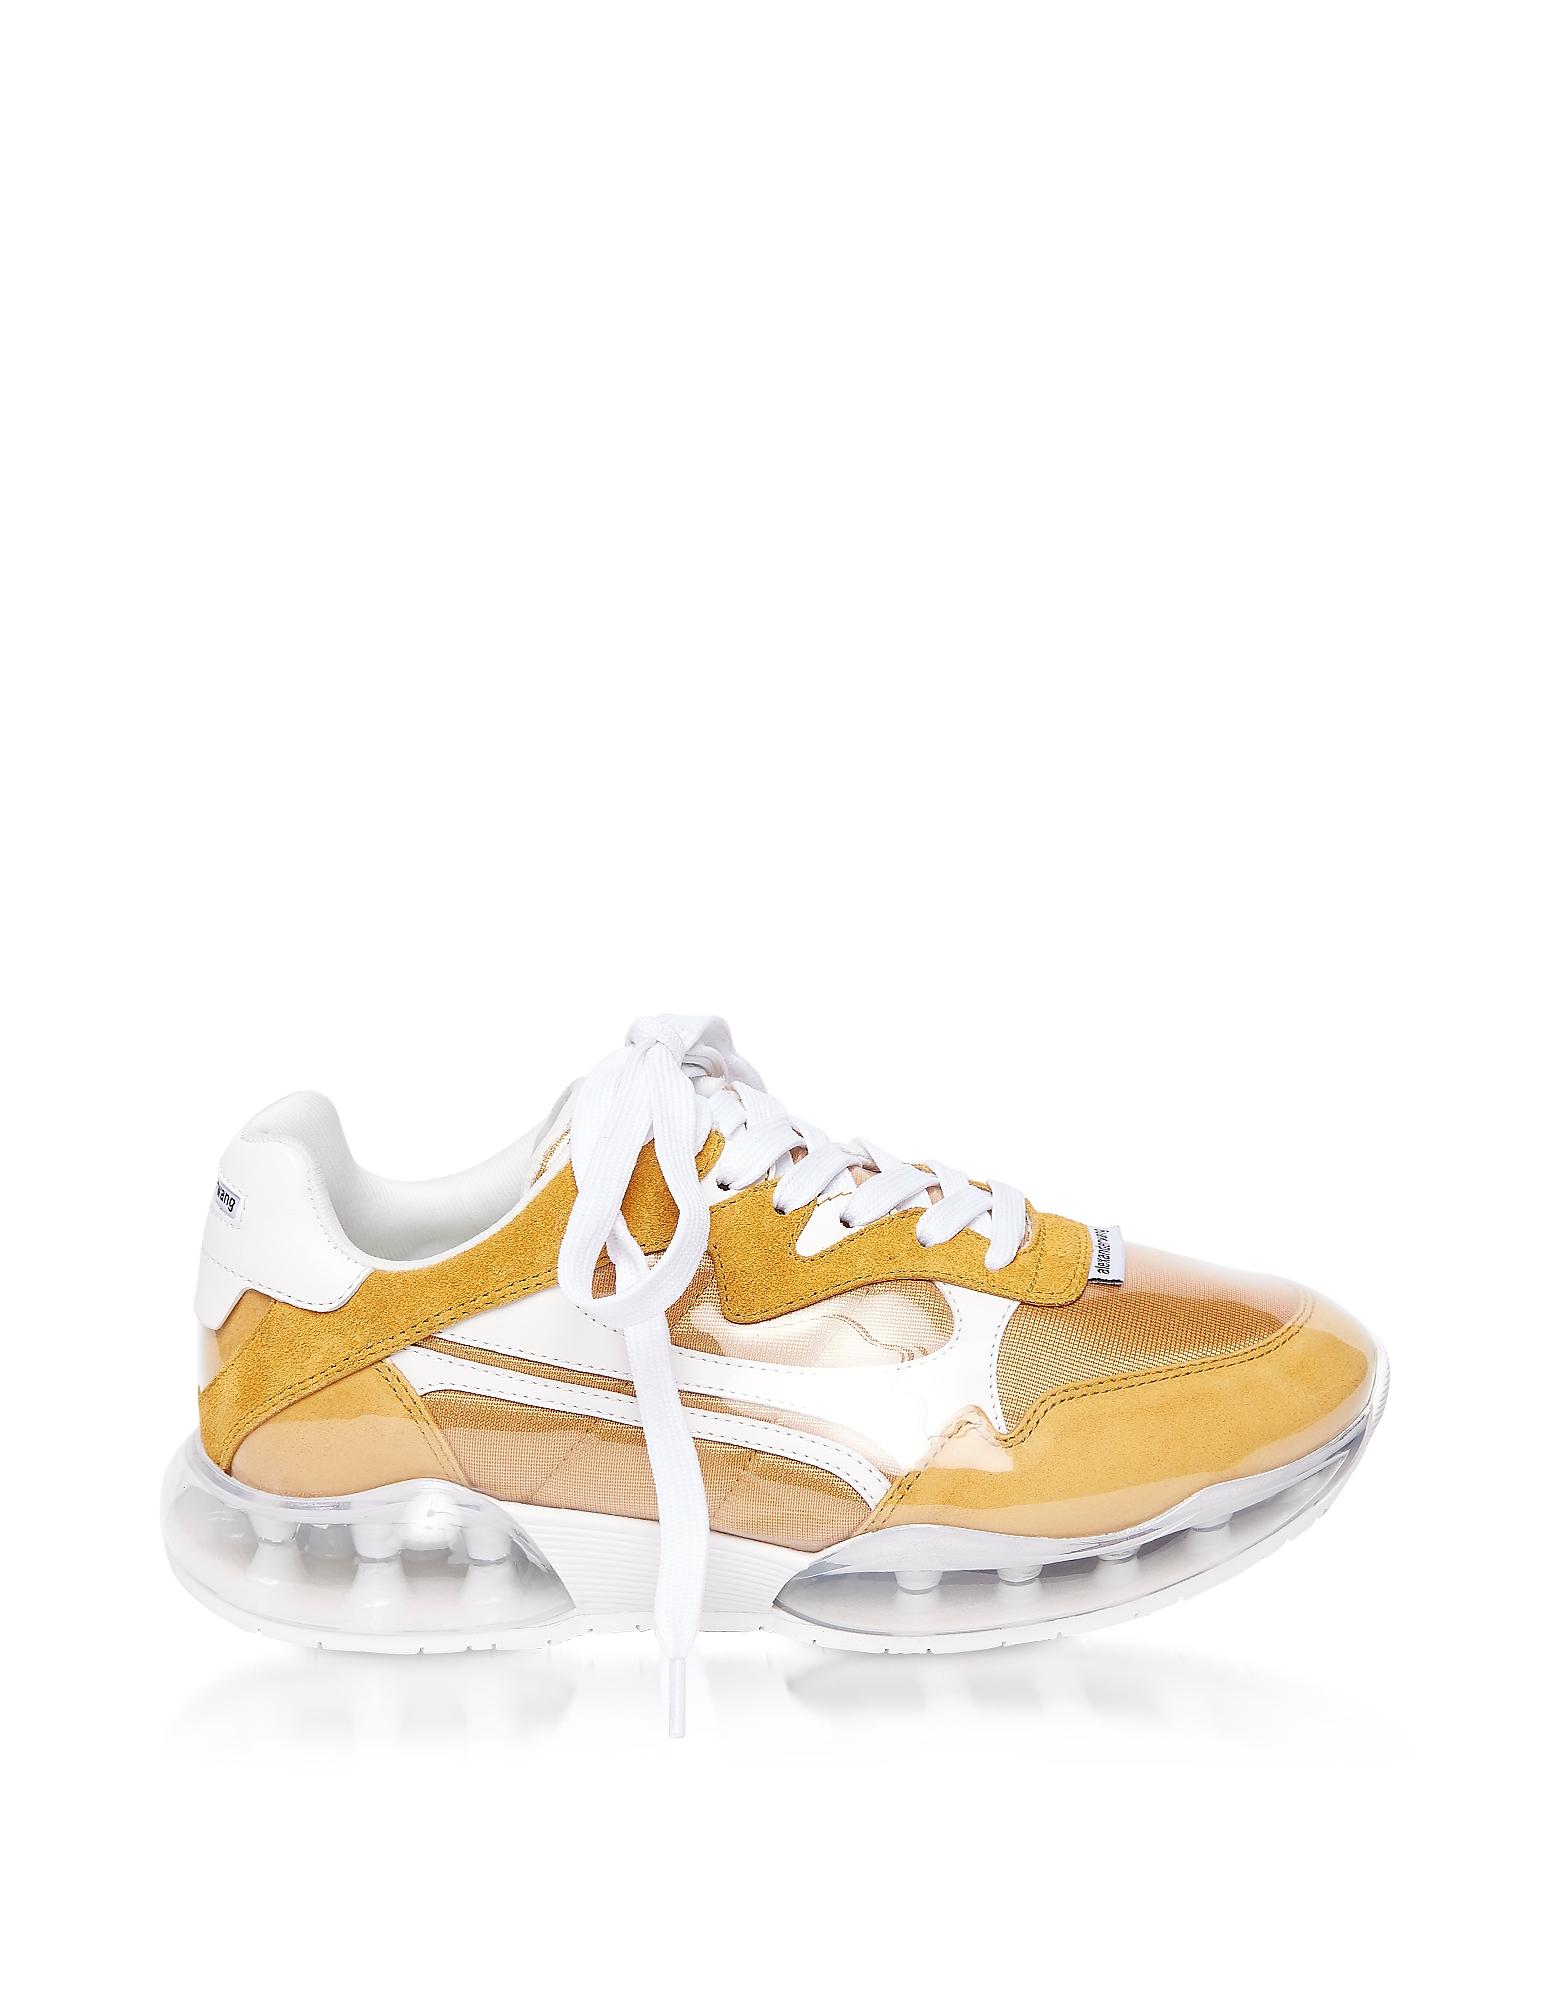 Alexander Wang Designer Shoes, Mineral Yellow Suede & Mesh Stadium Sneakers